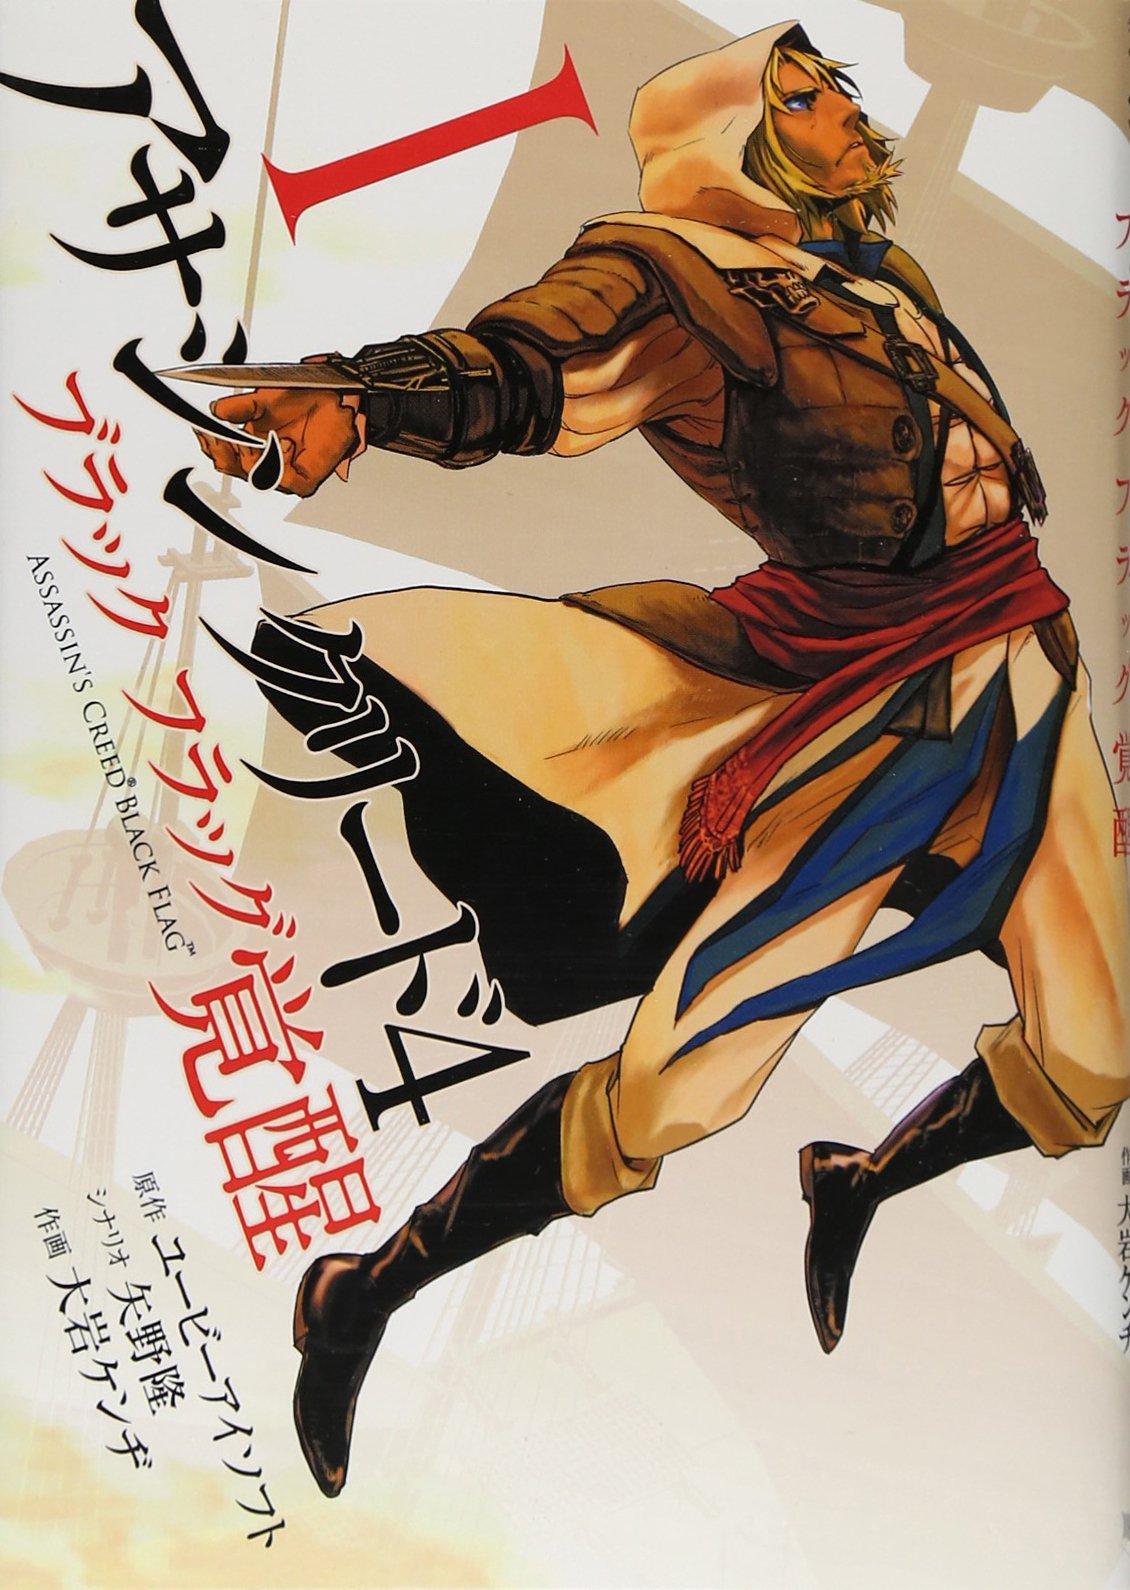 Assassin S Creed 4 Black Flag Kakusei Vol 1 Young Jump